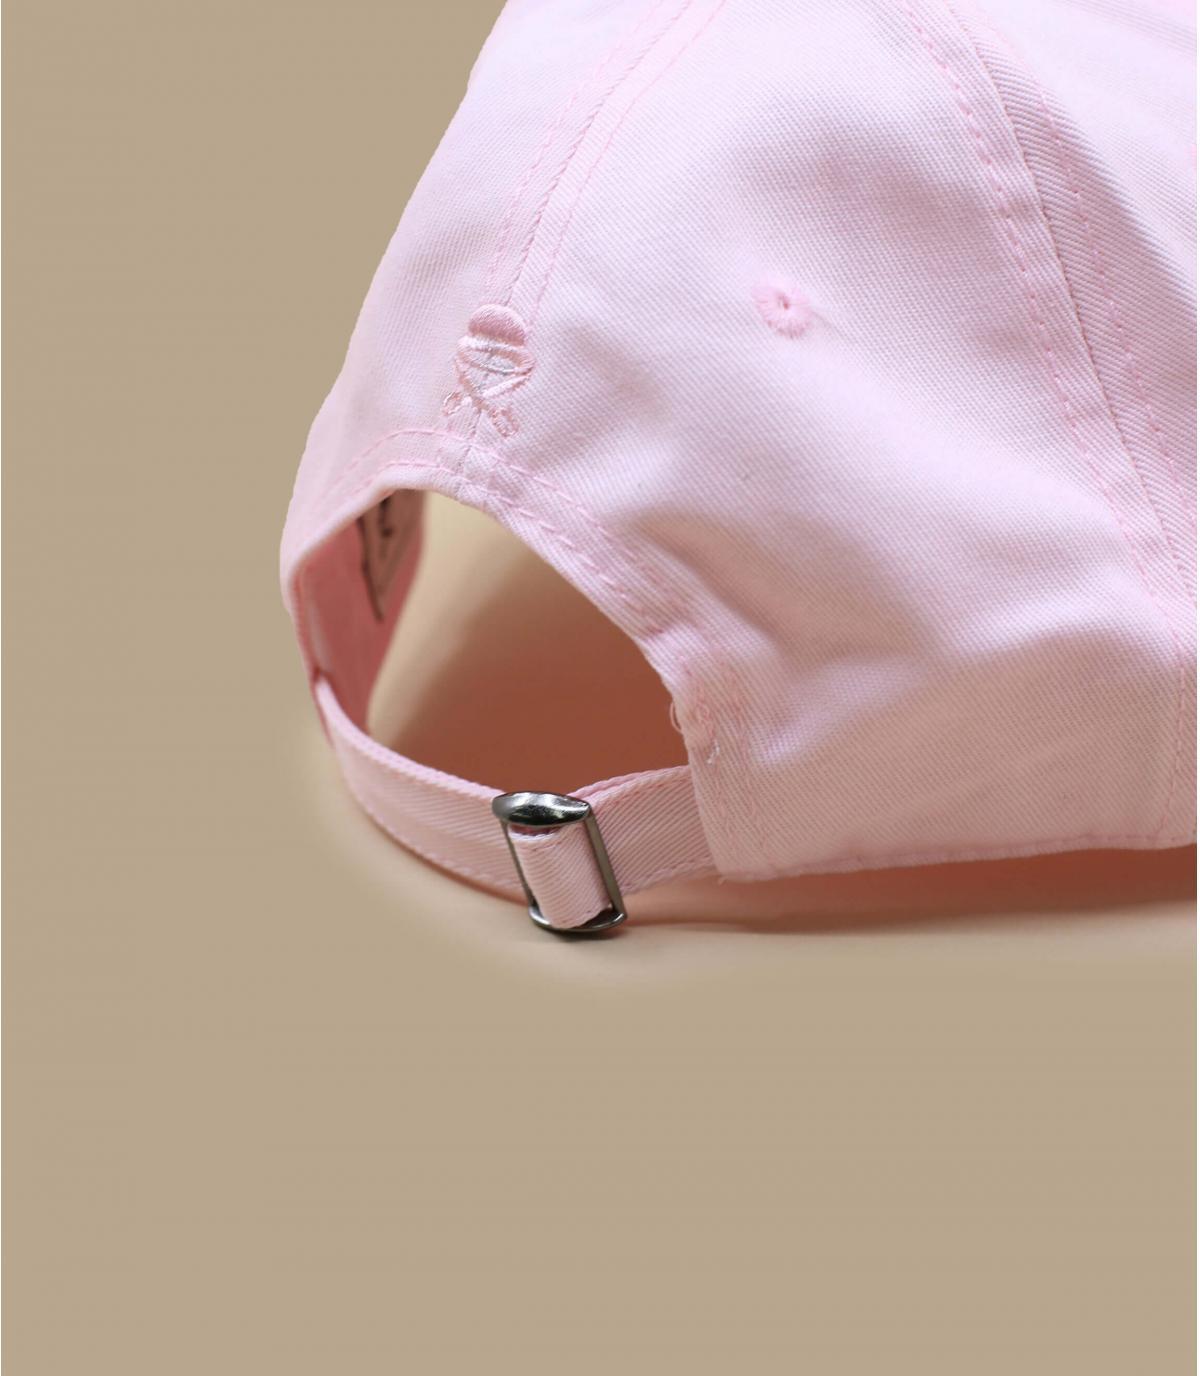 Dettagli Chosen One Curved Cap pale pink - image 4